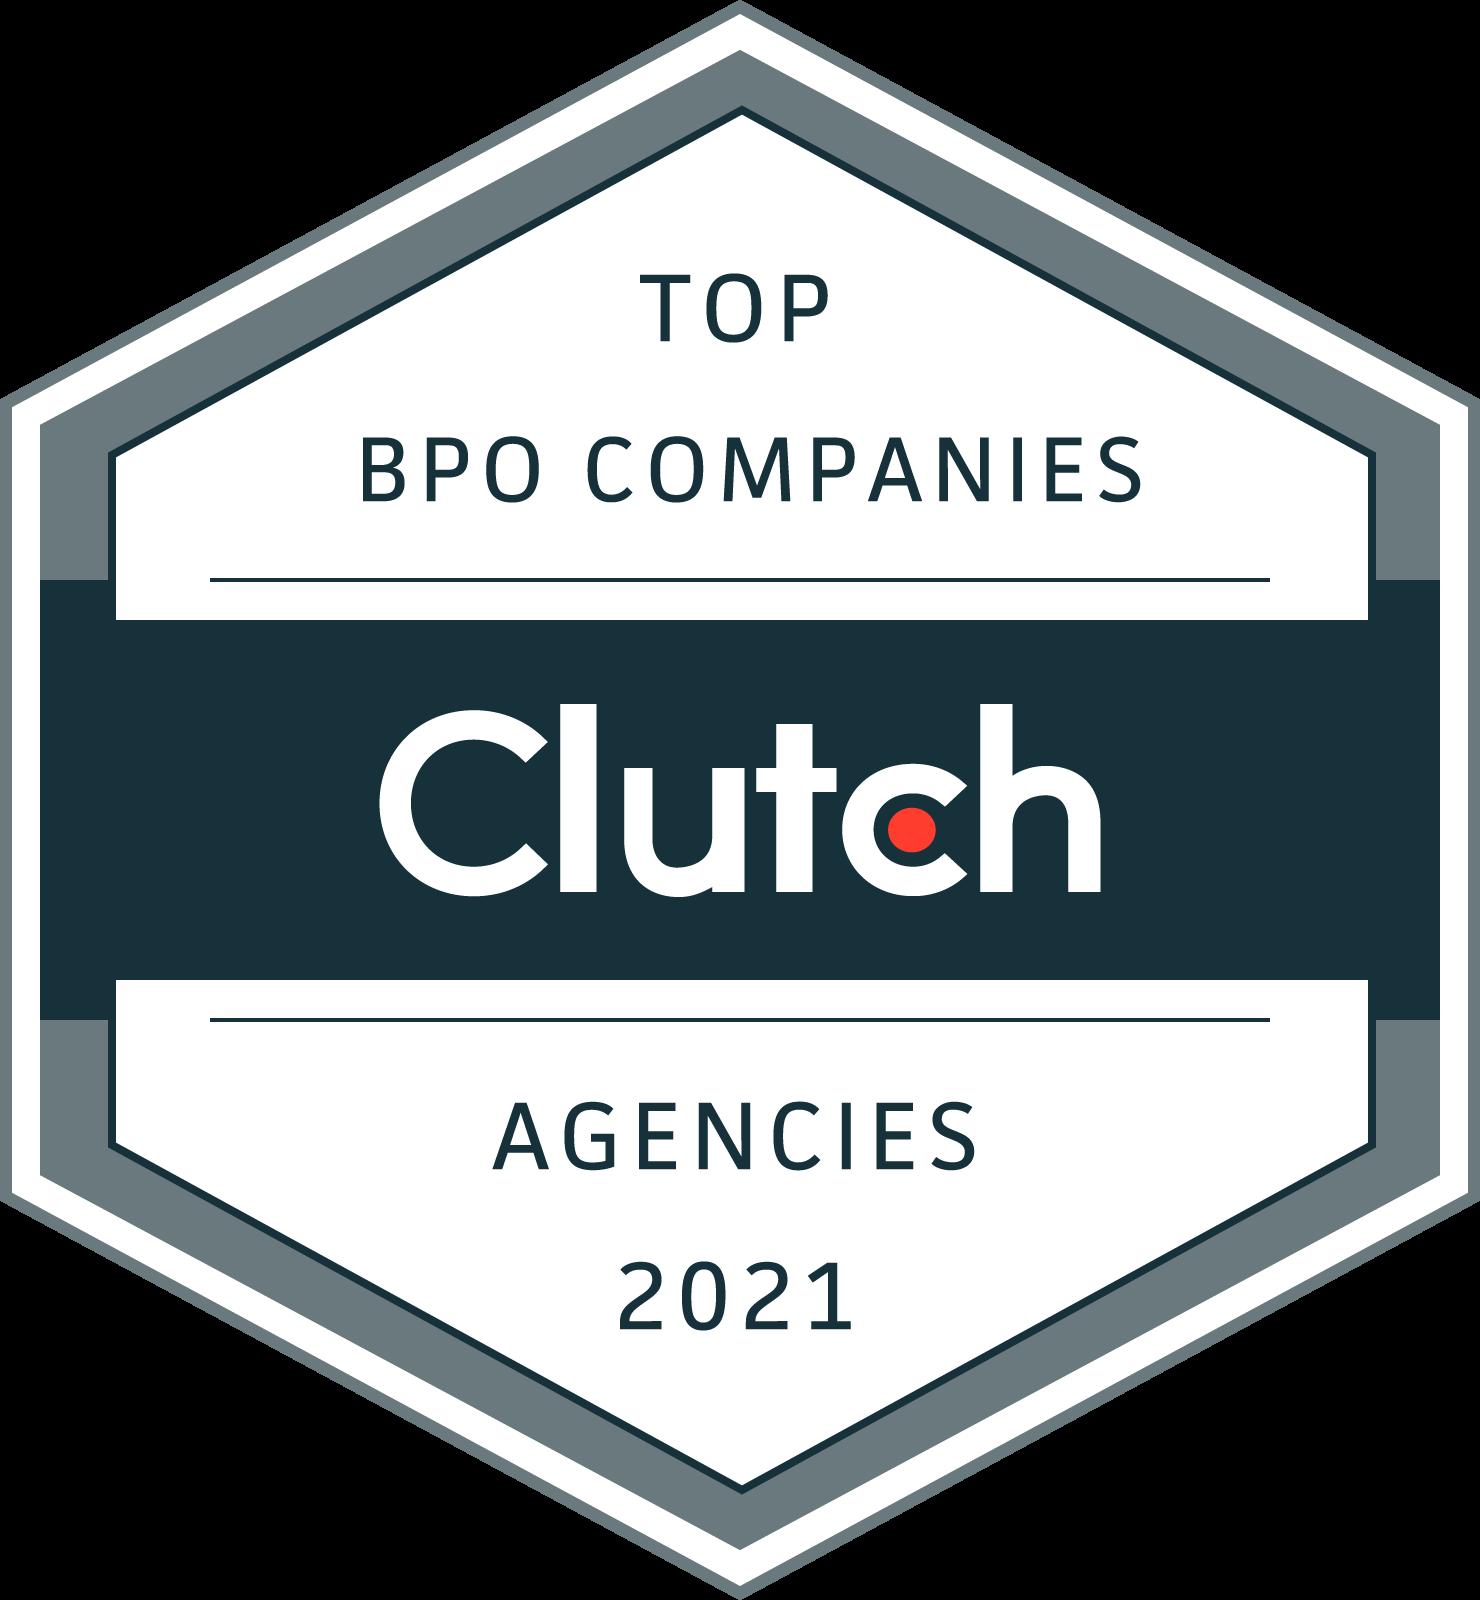 Cluch 2021 top bpo